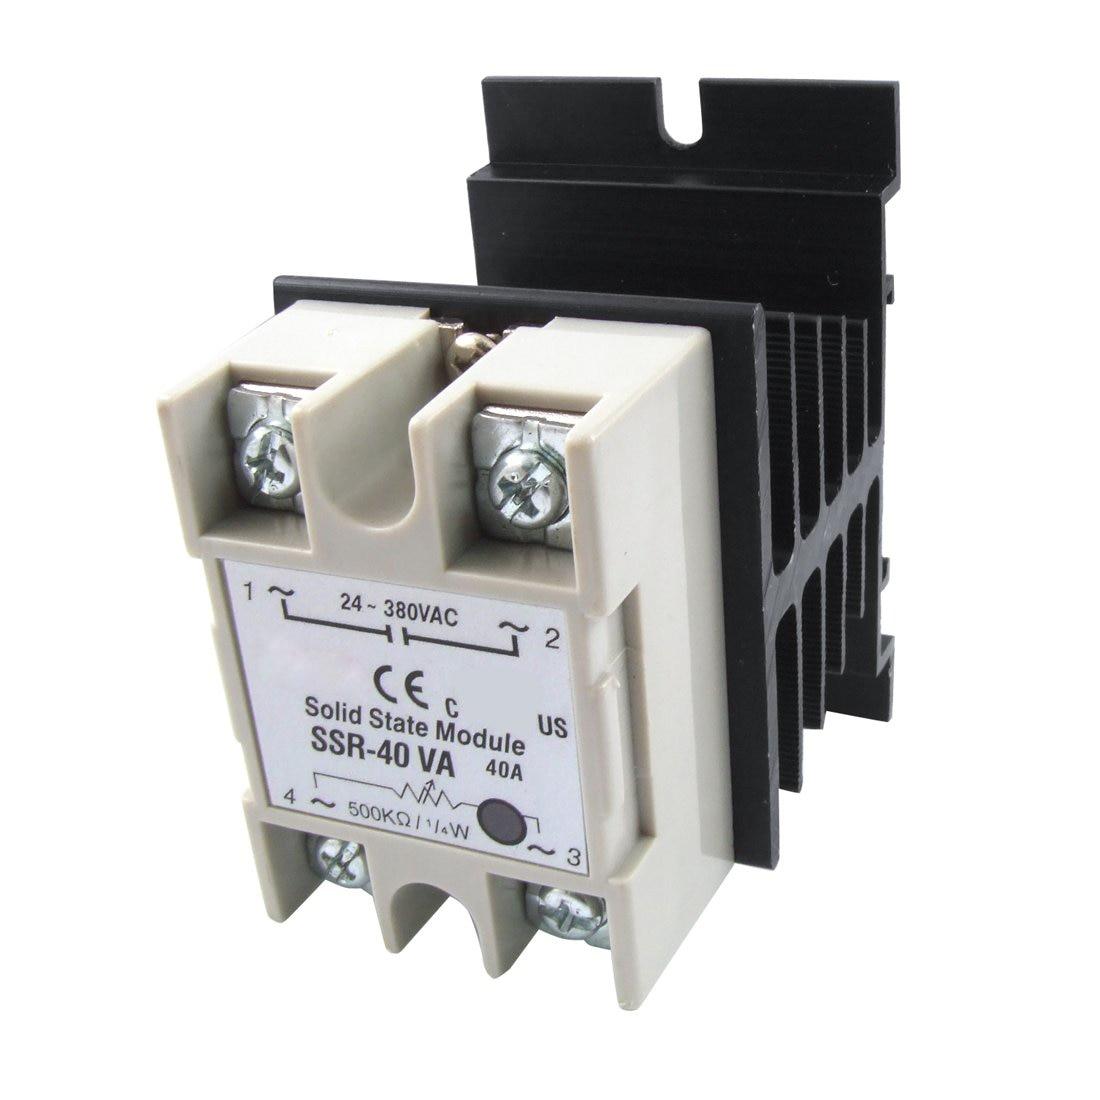 MYLB VolTage Resistance Regulator Solid State Relay SSR 40A 24-380V AC w Heat SInk